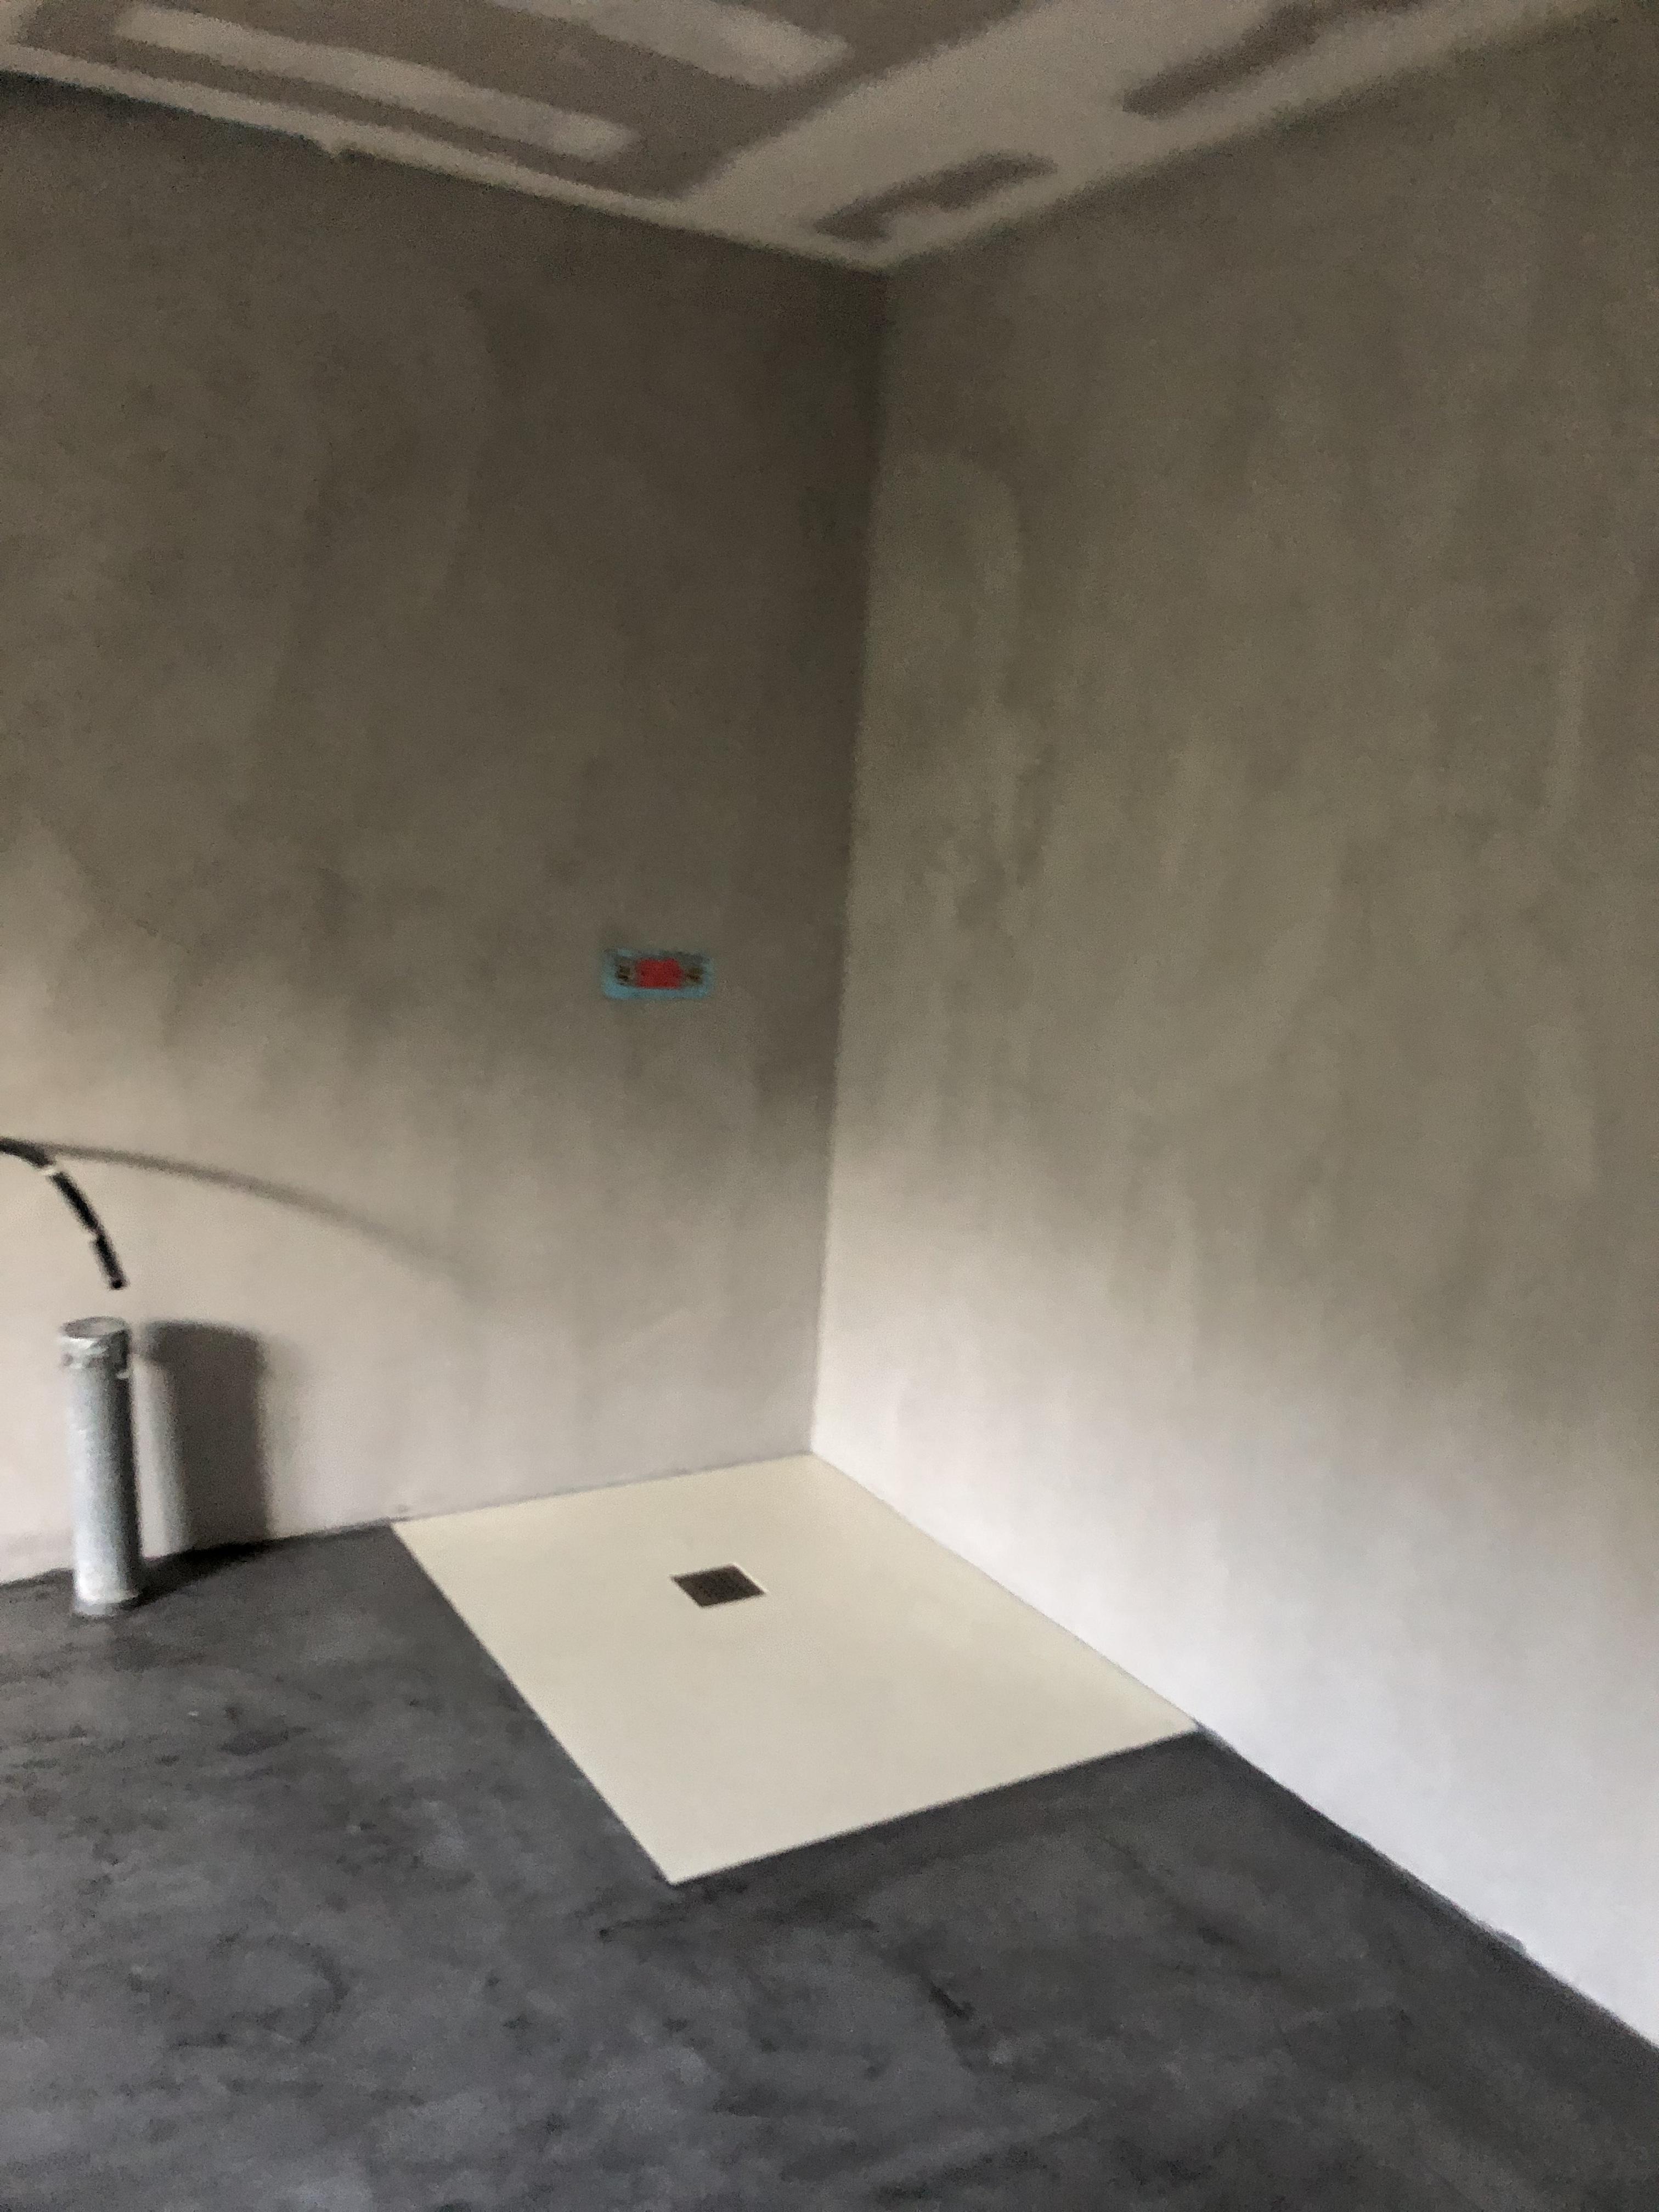 Beton Ciré Salle De Bain élégante rénovation d'une salle de bain en béton ciré